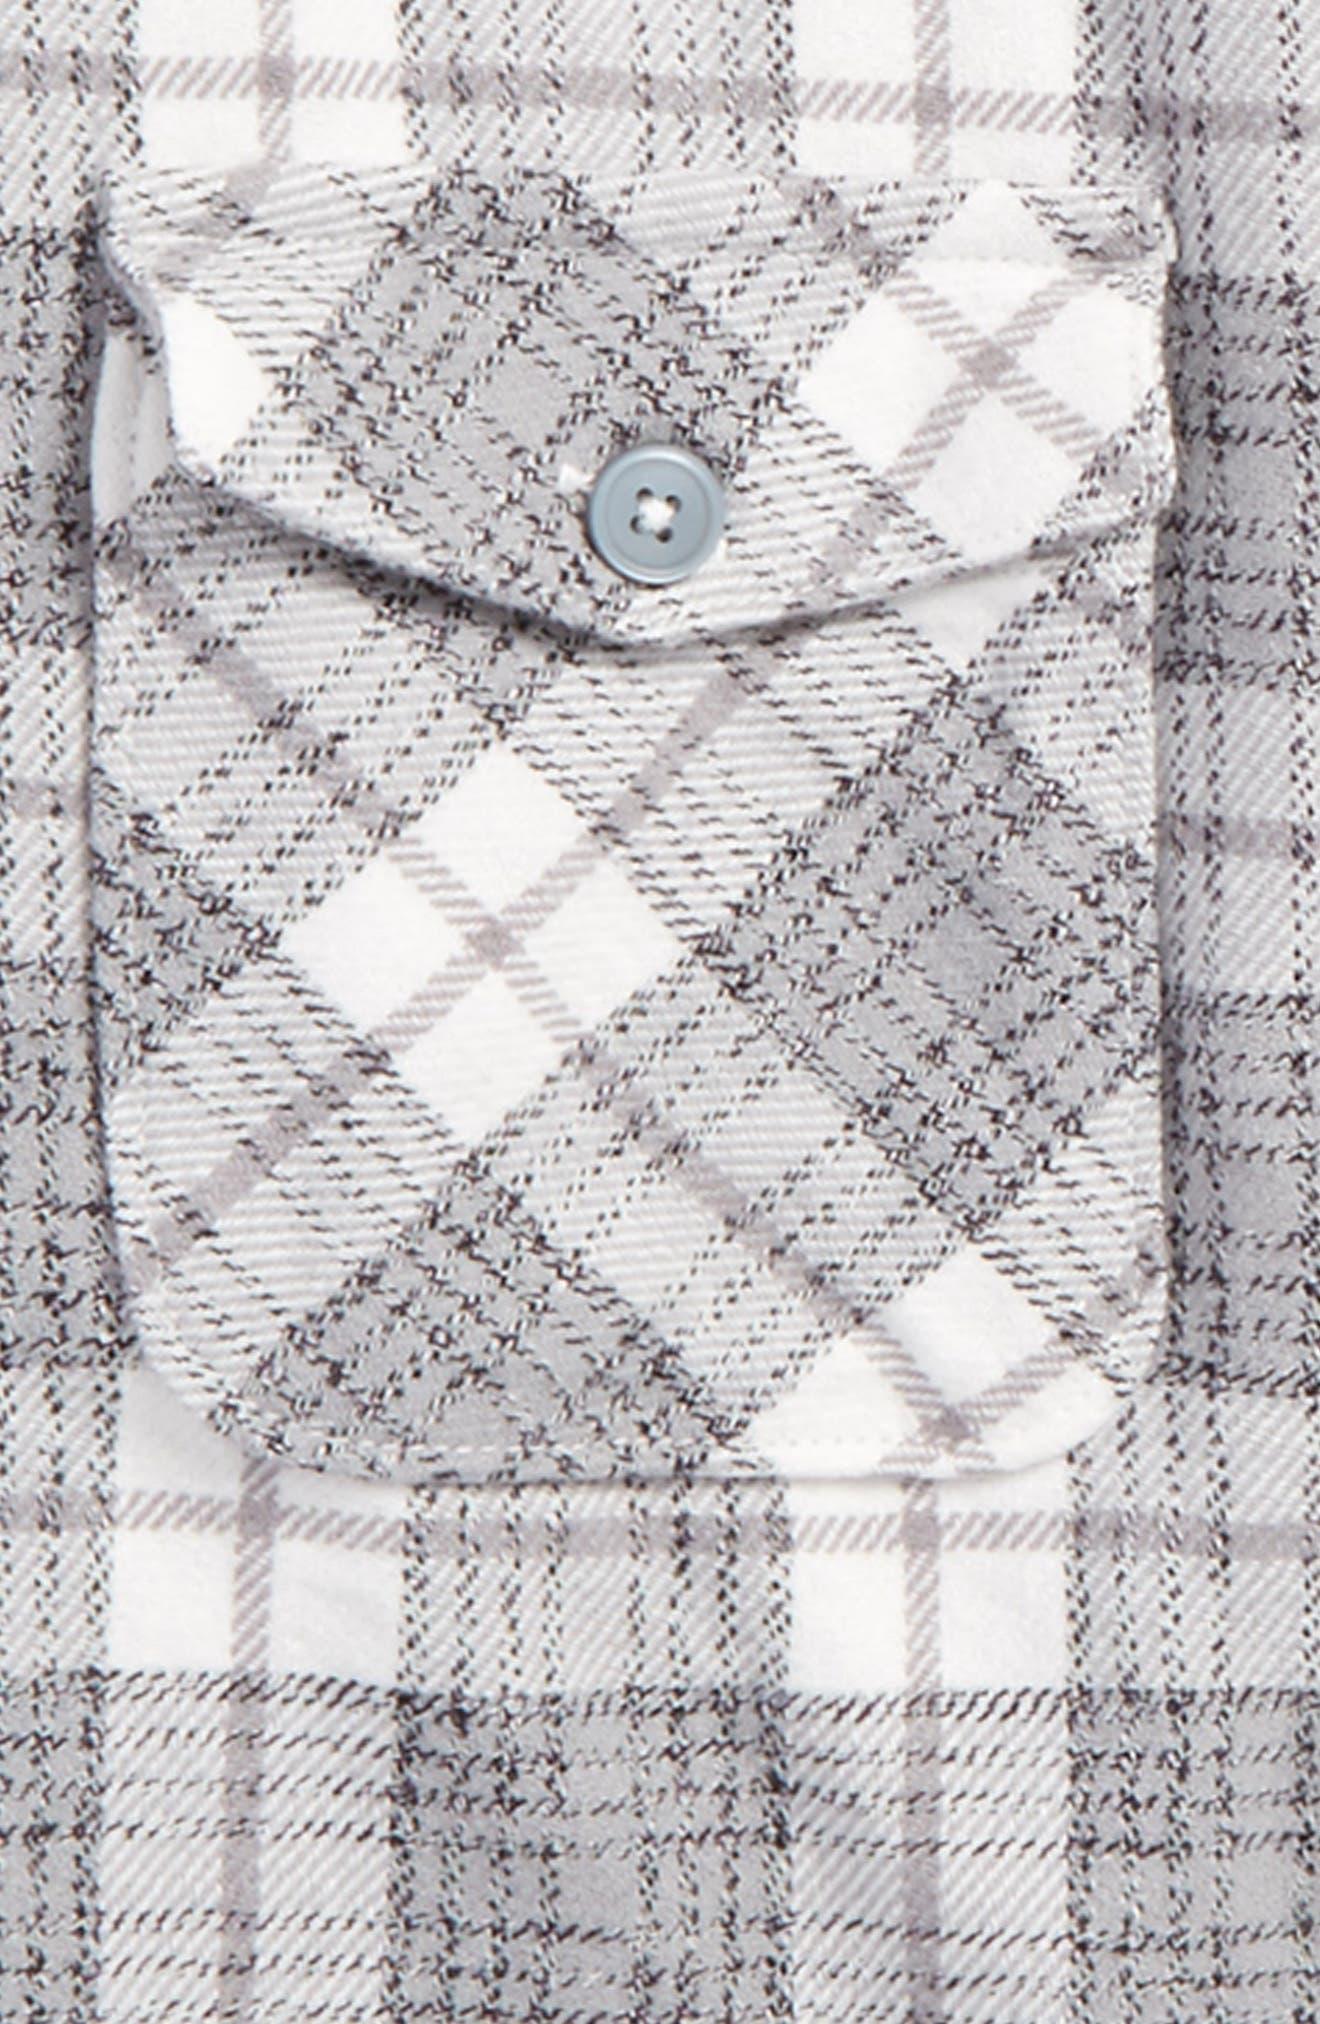 That'll Work Plaid Flannel Shirt,                             Alternate thumbnail 2, color,                             111